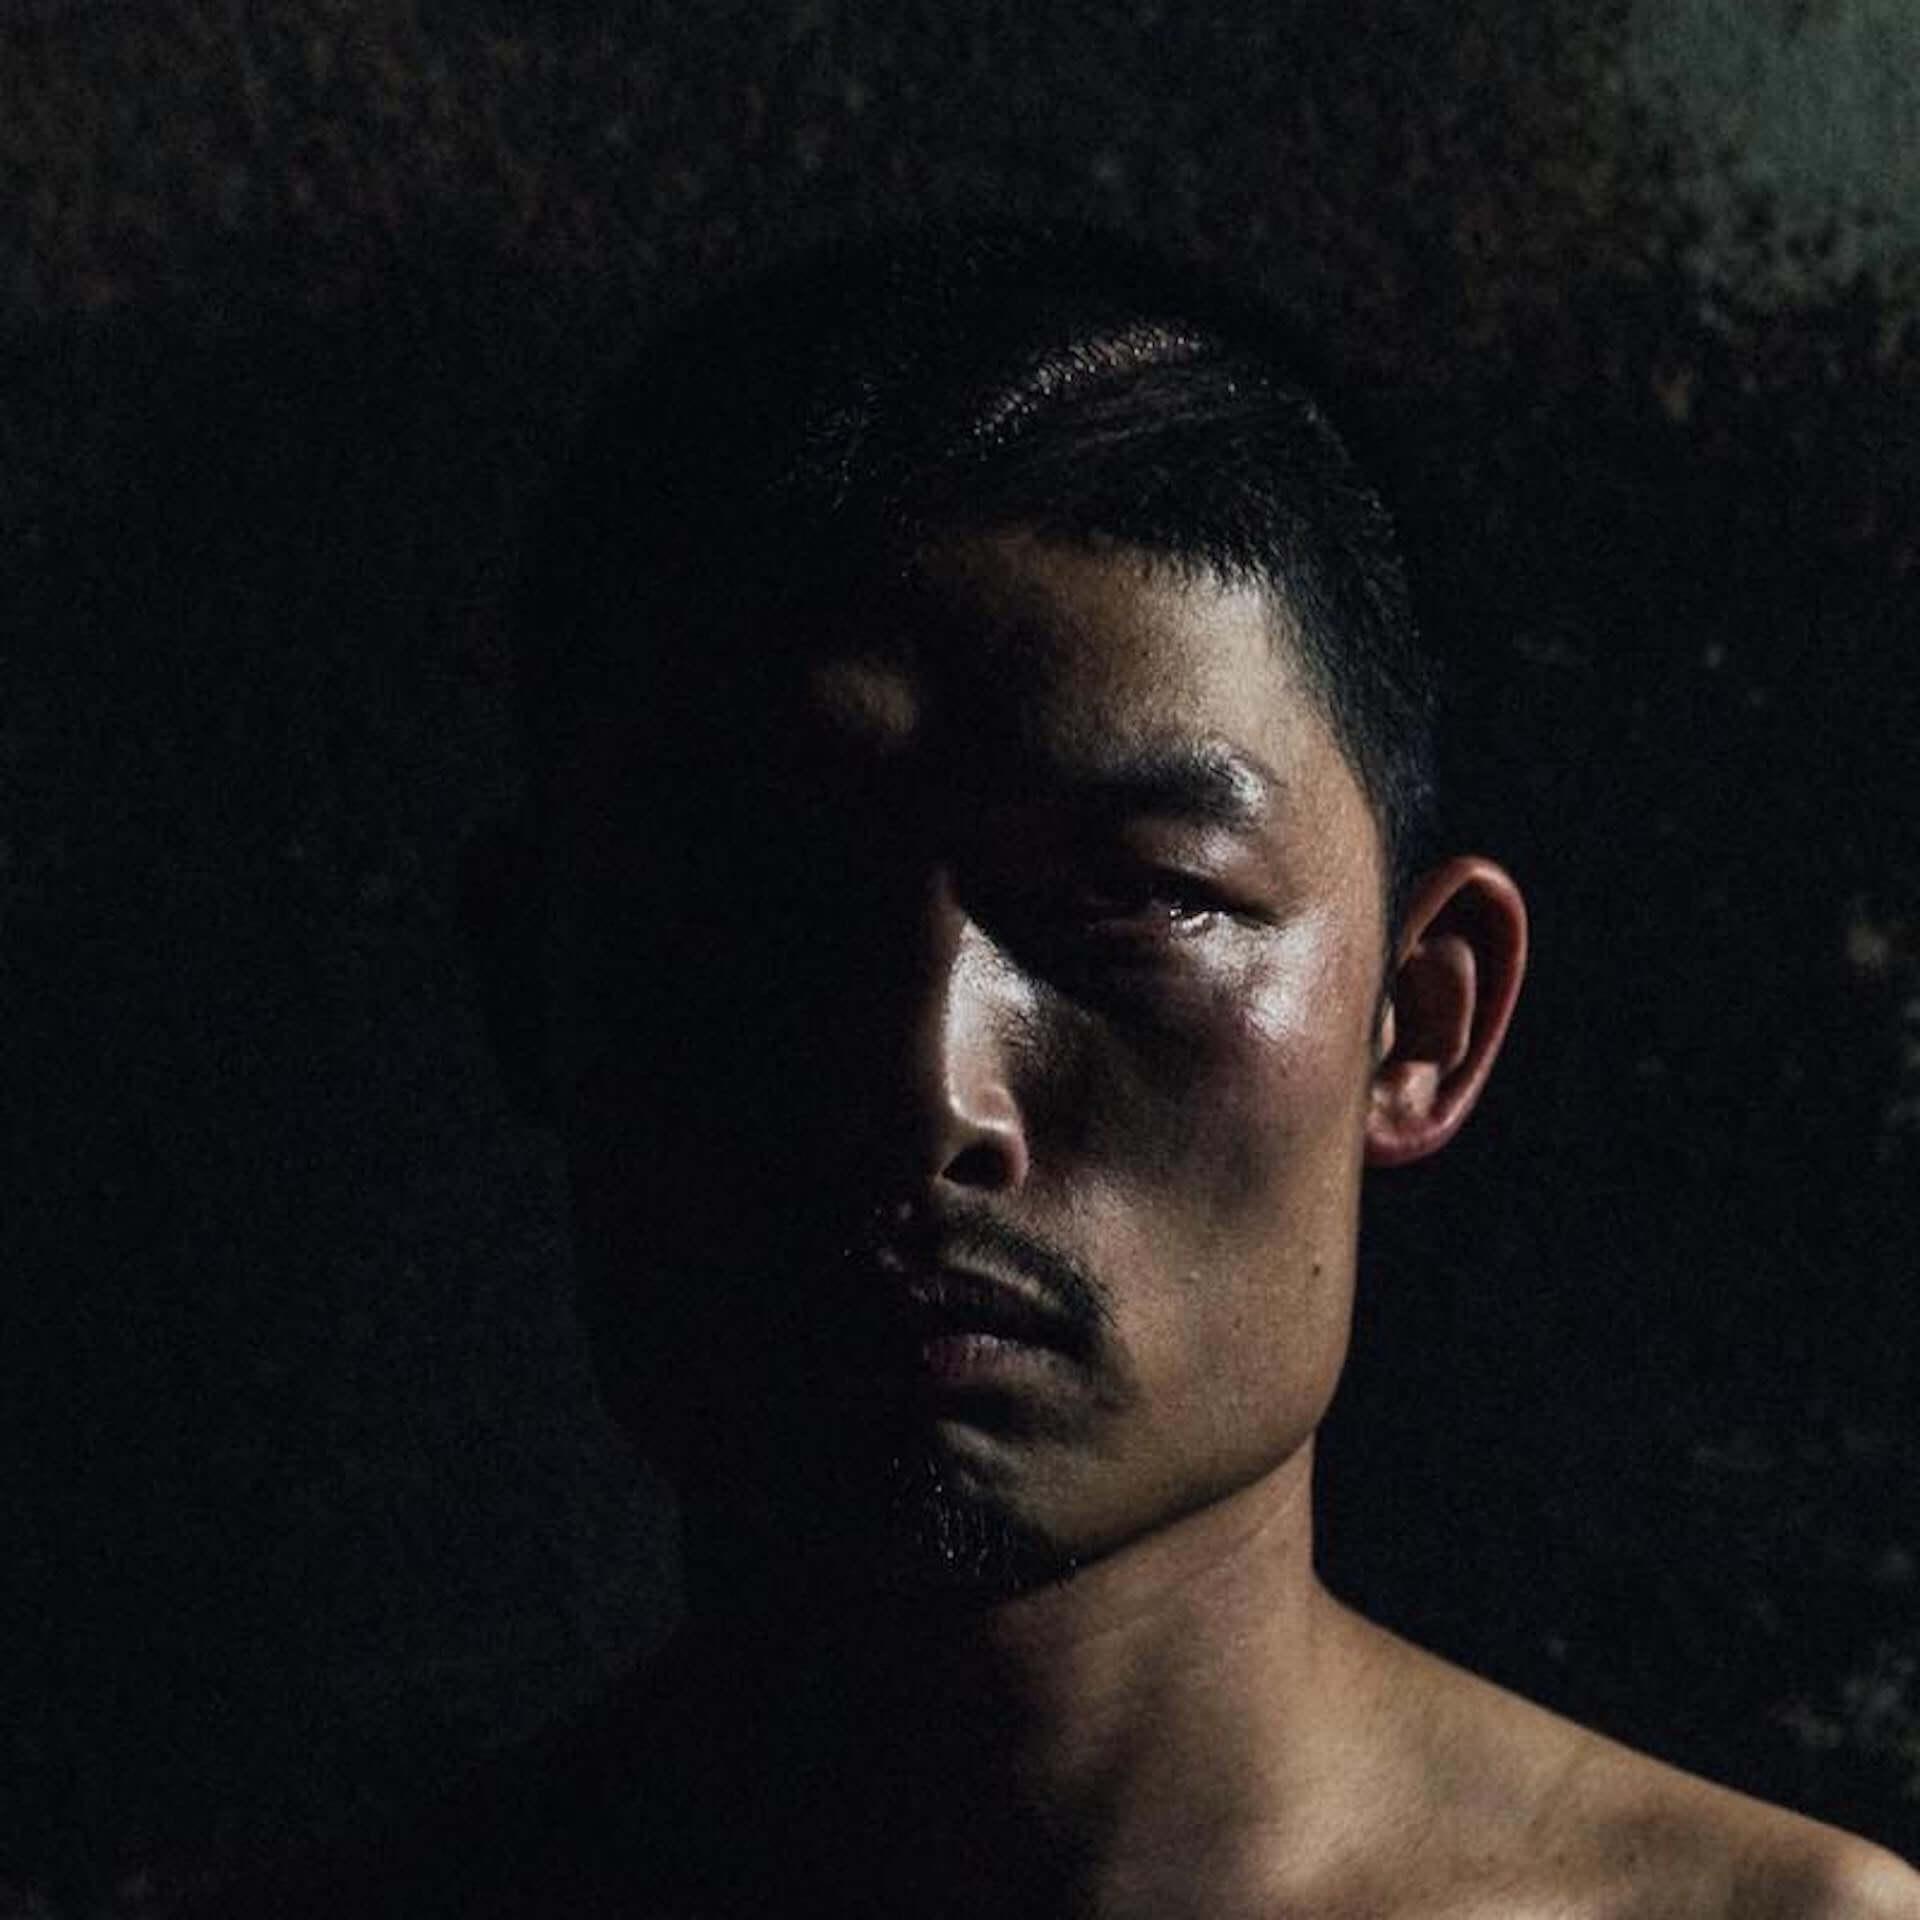 ¥ØU$UK€ ¥UK1MAT$Uが渋谷Contact<ARTHRALGIA>にゲスト出演!Albino Sound、Hibi Blissも登場 music200929_yousuke-yukimatsu_2-1920x1920